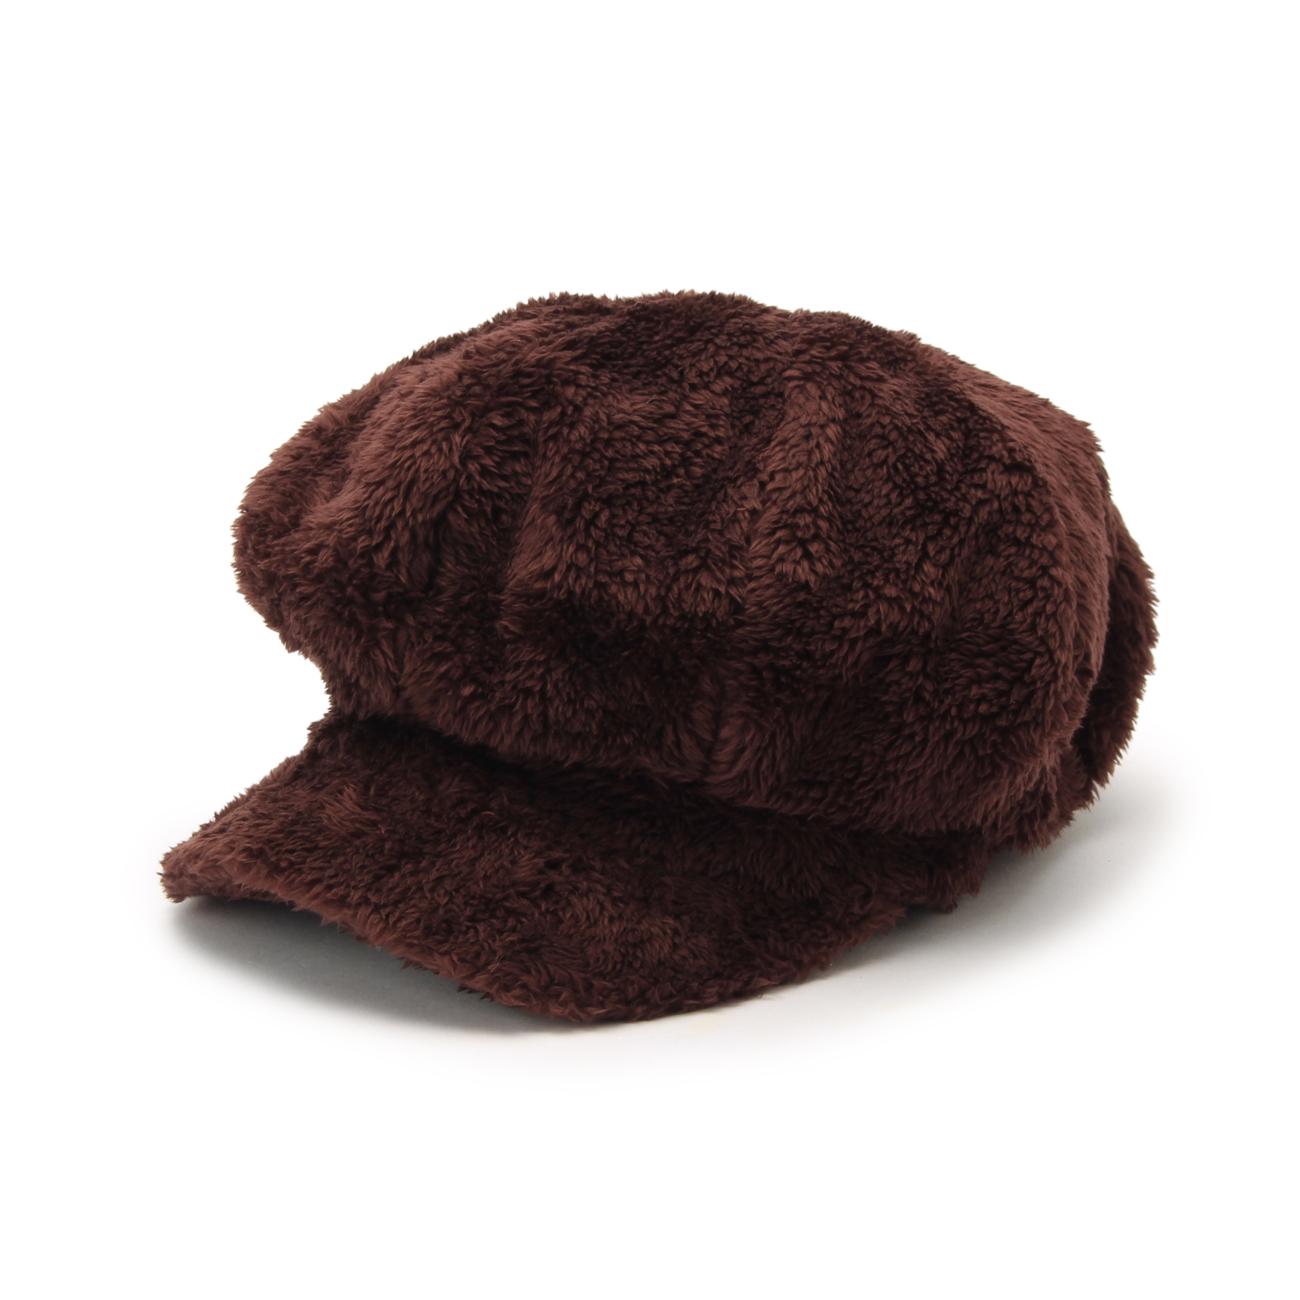 【SHOO・LA・RUE(Kids) (シューラルー)】ボアキャスケットキッズ 帽子 キャスケット ブラウン